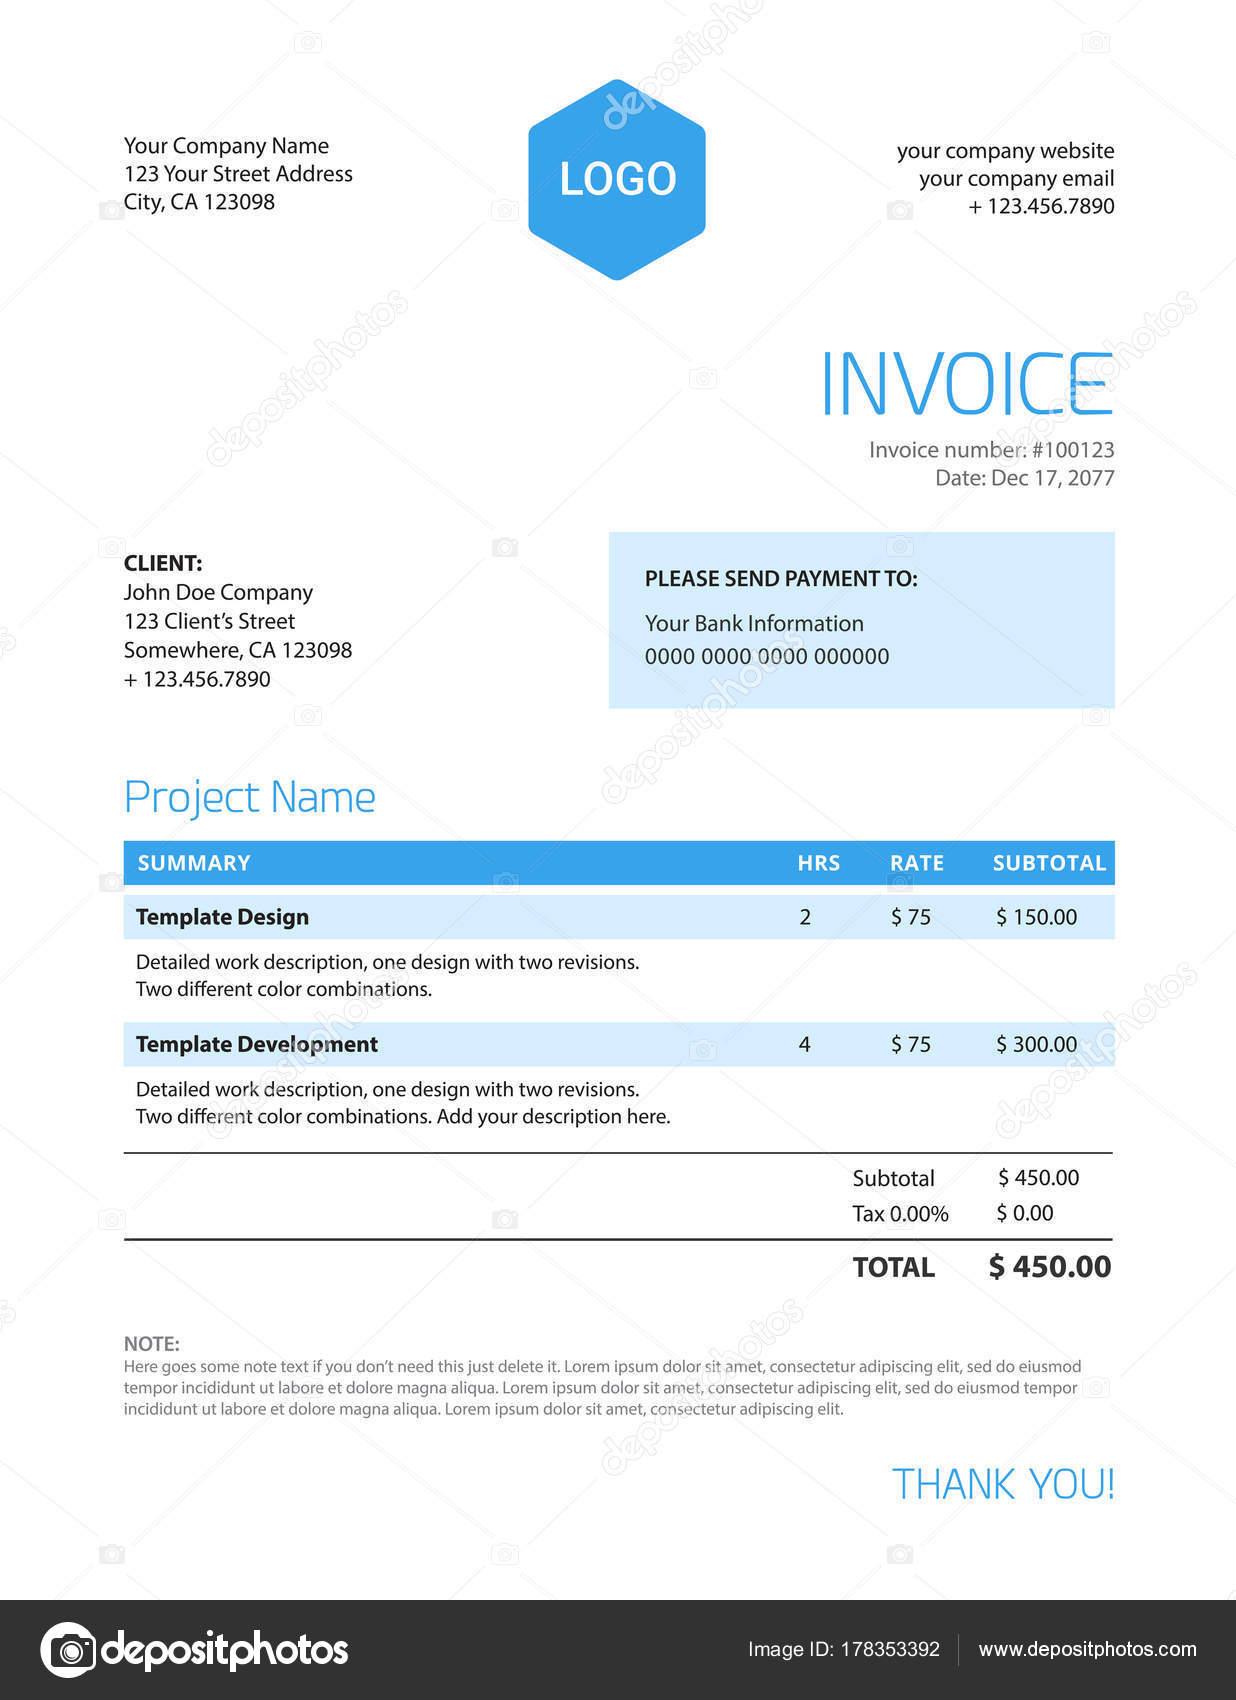 Invoice template - blue color minimalist design — Stock Vector ...